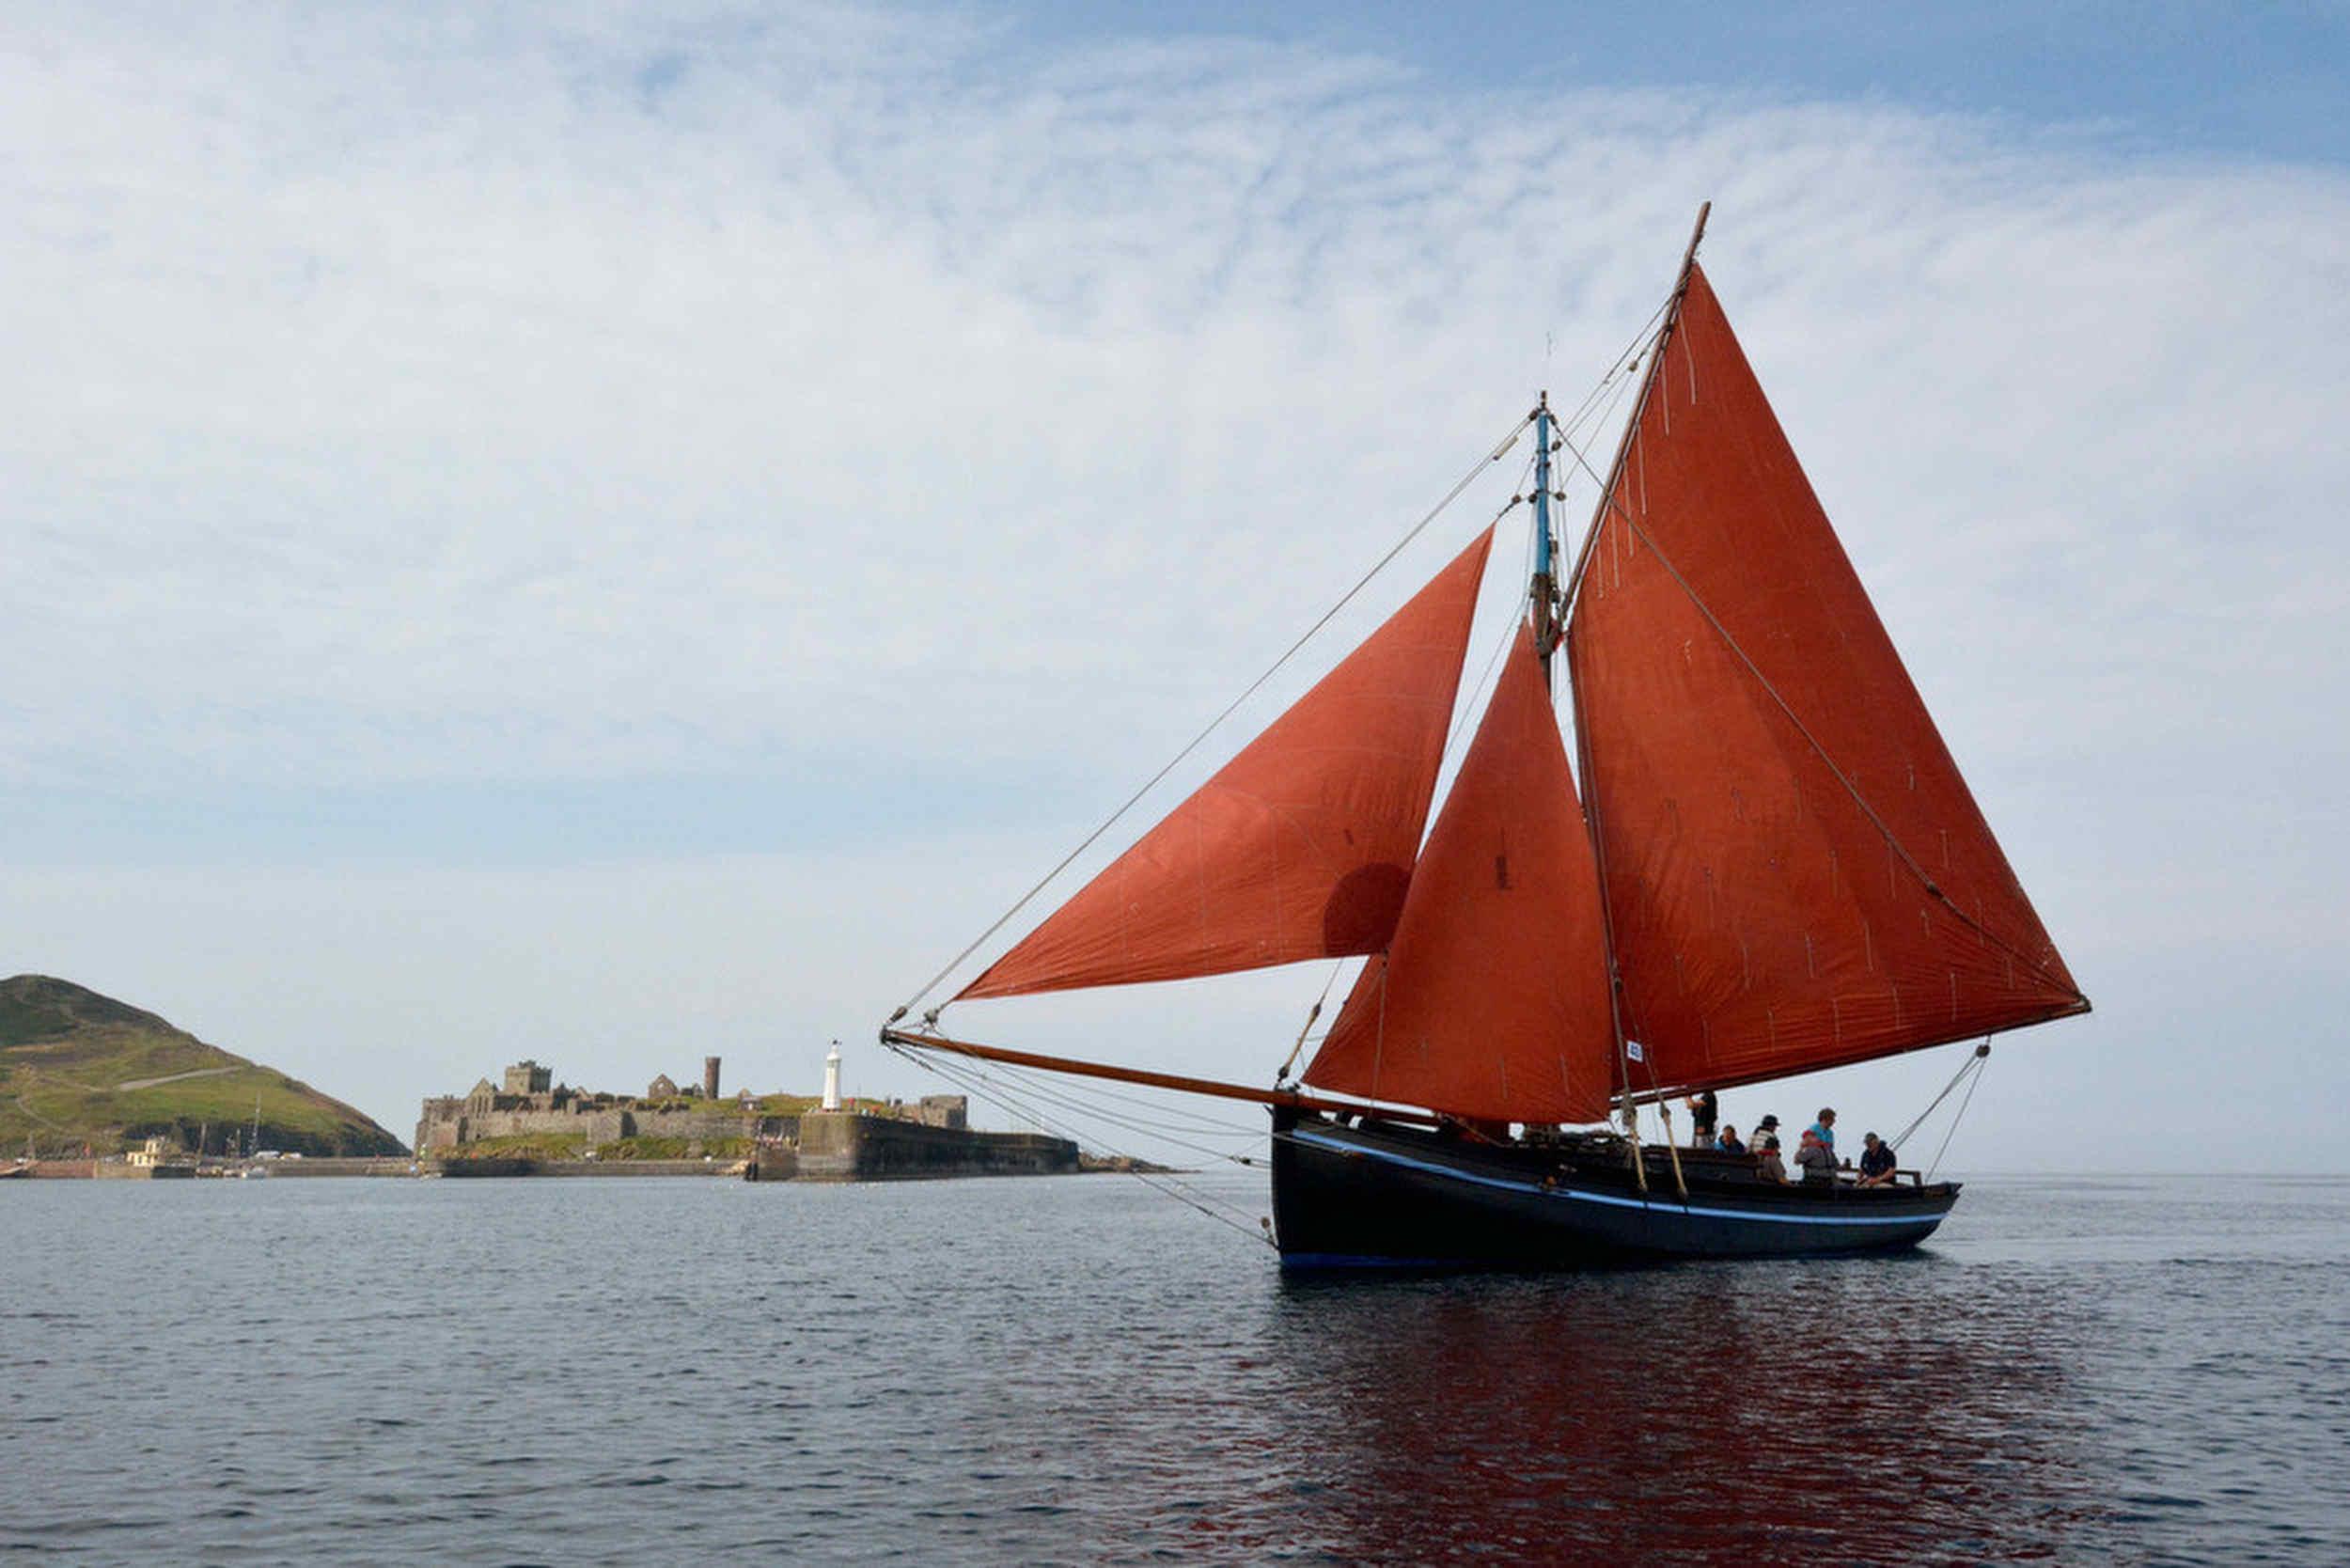 Peel Traditional Boat Festival